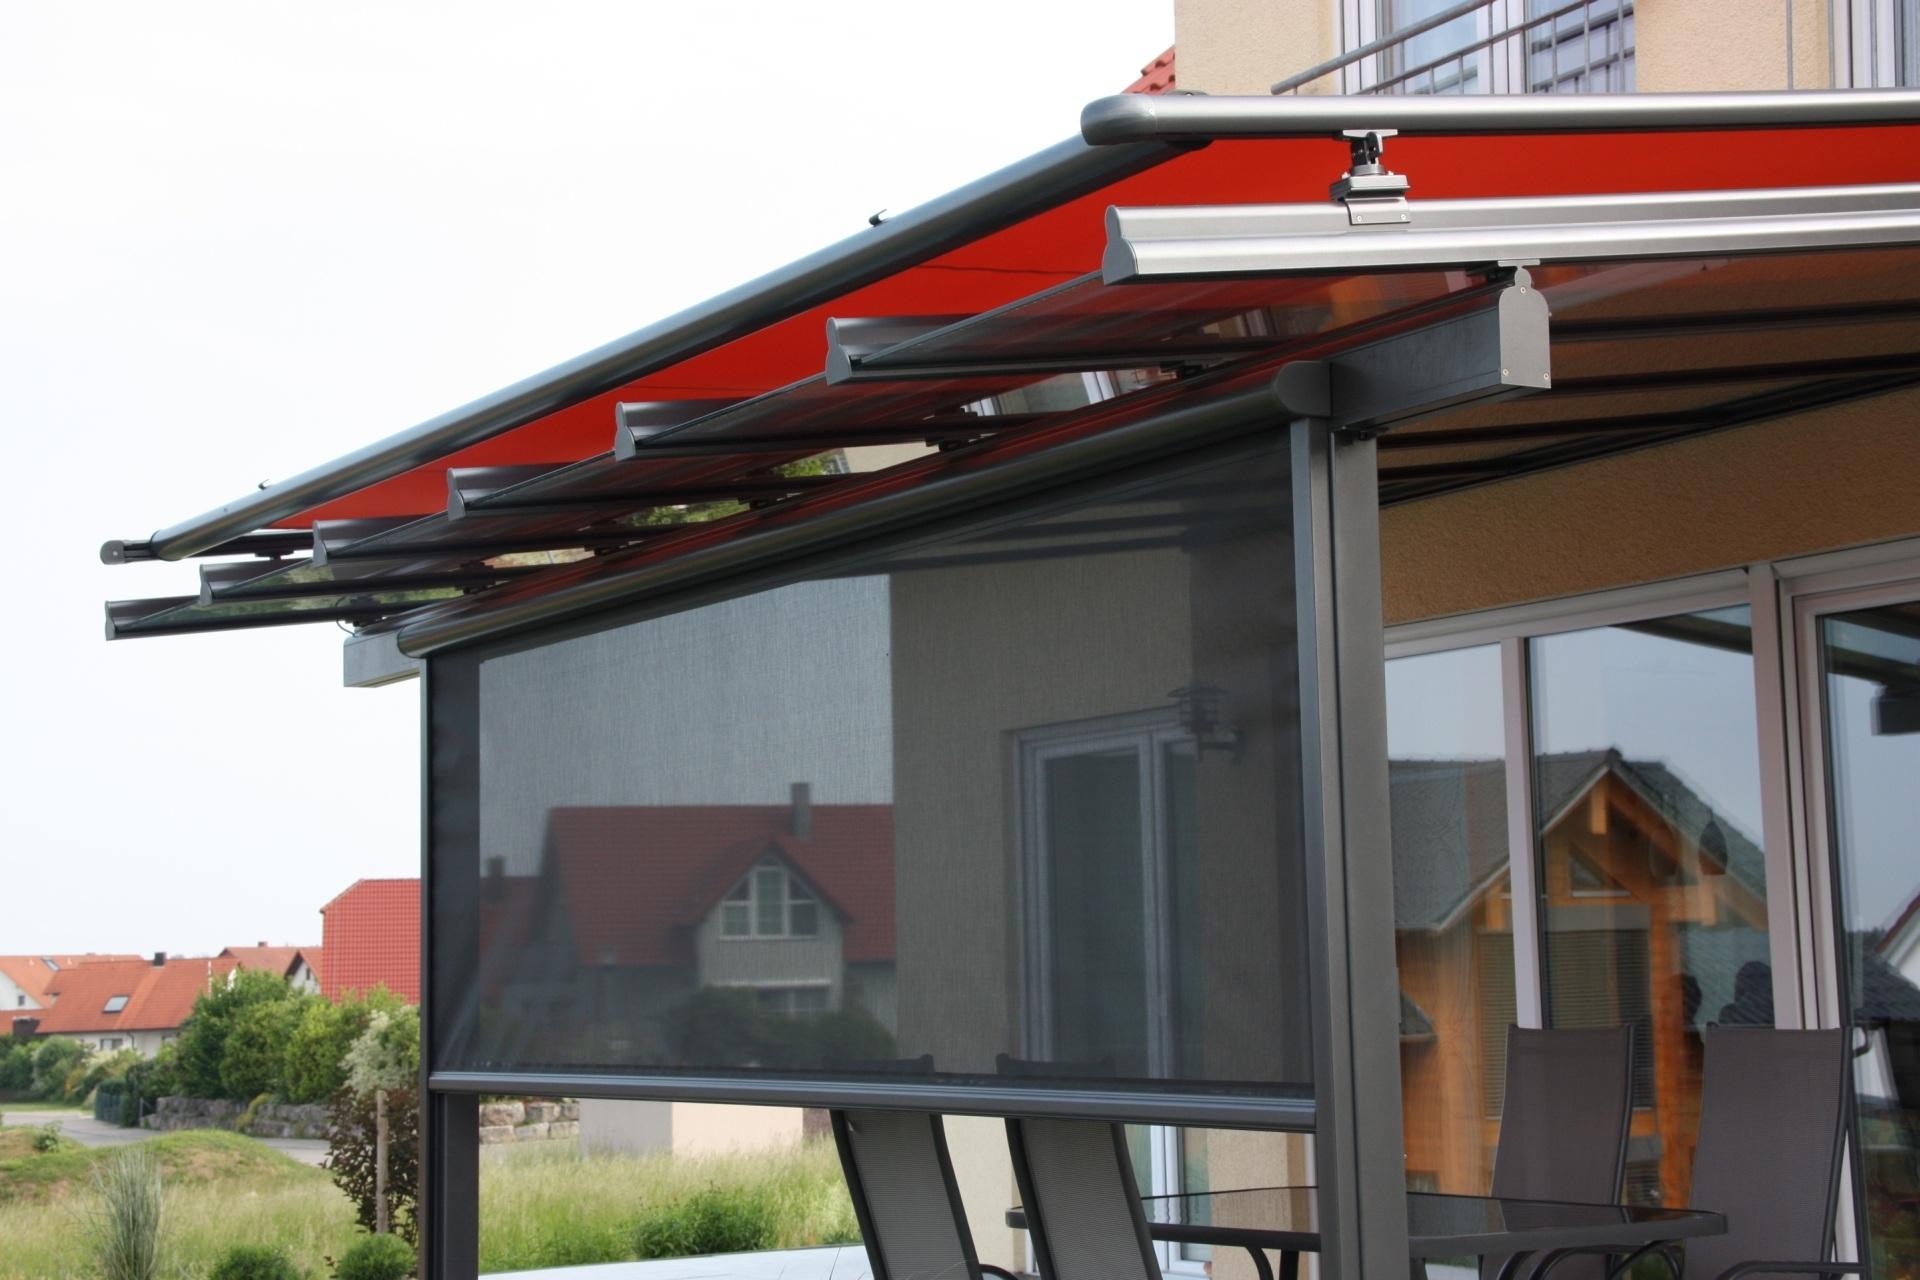 vertikalbeschattung richter bauelemente gmbh. Black Bedroom Furniture Sets. Home Design Ideas